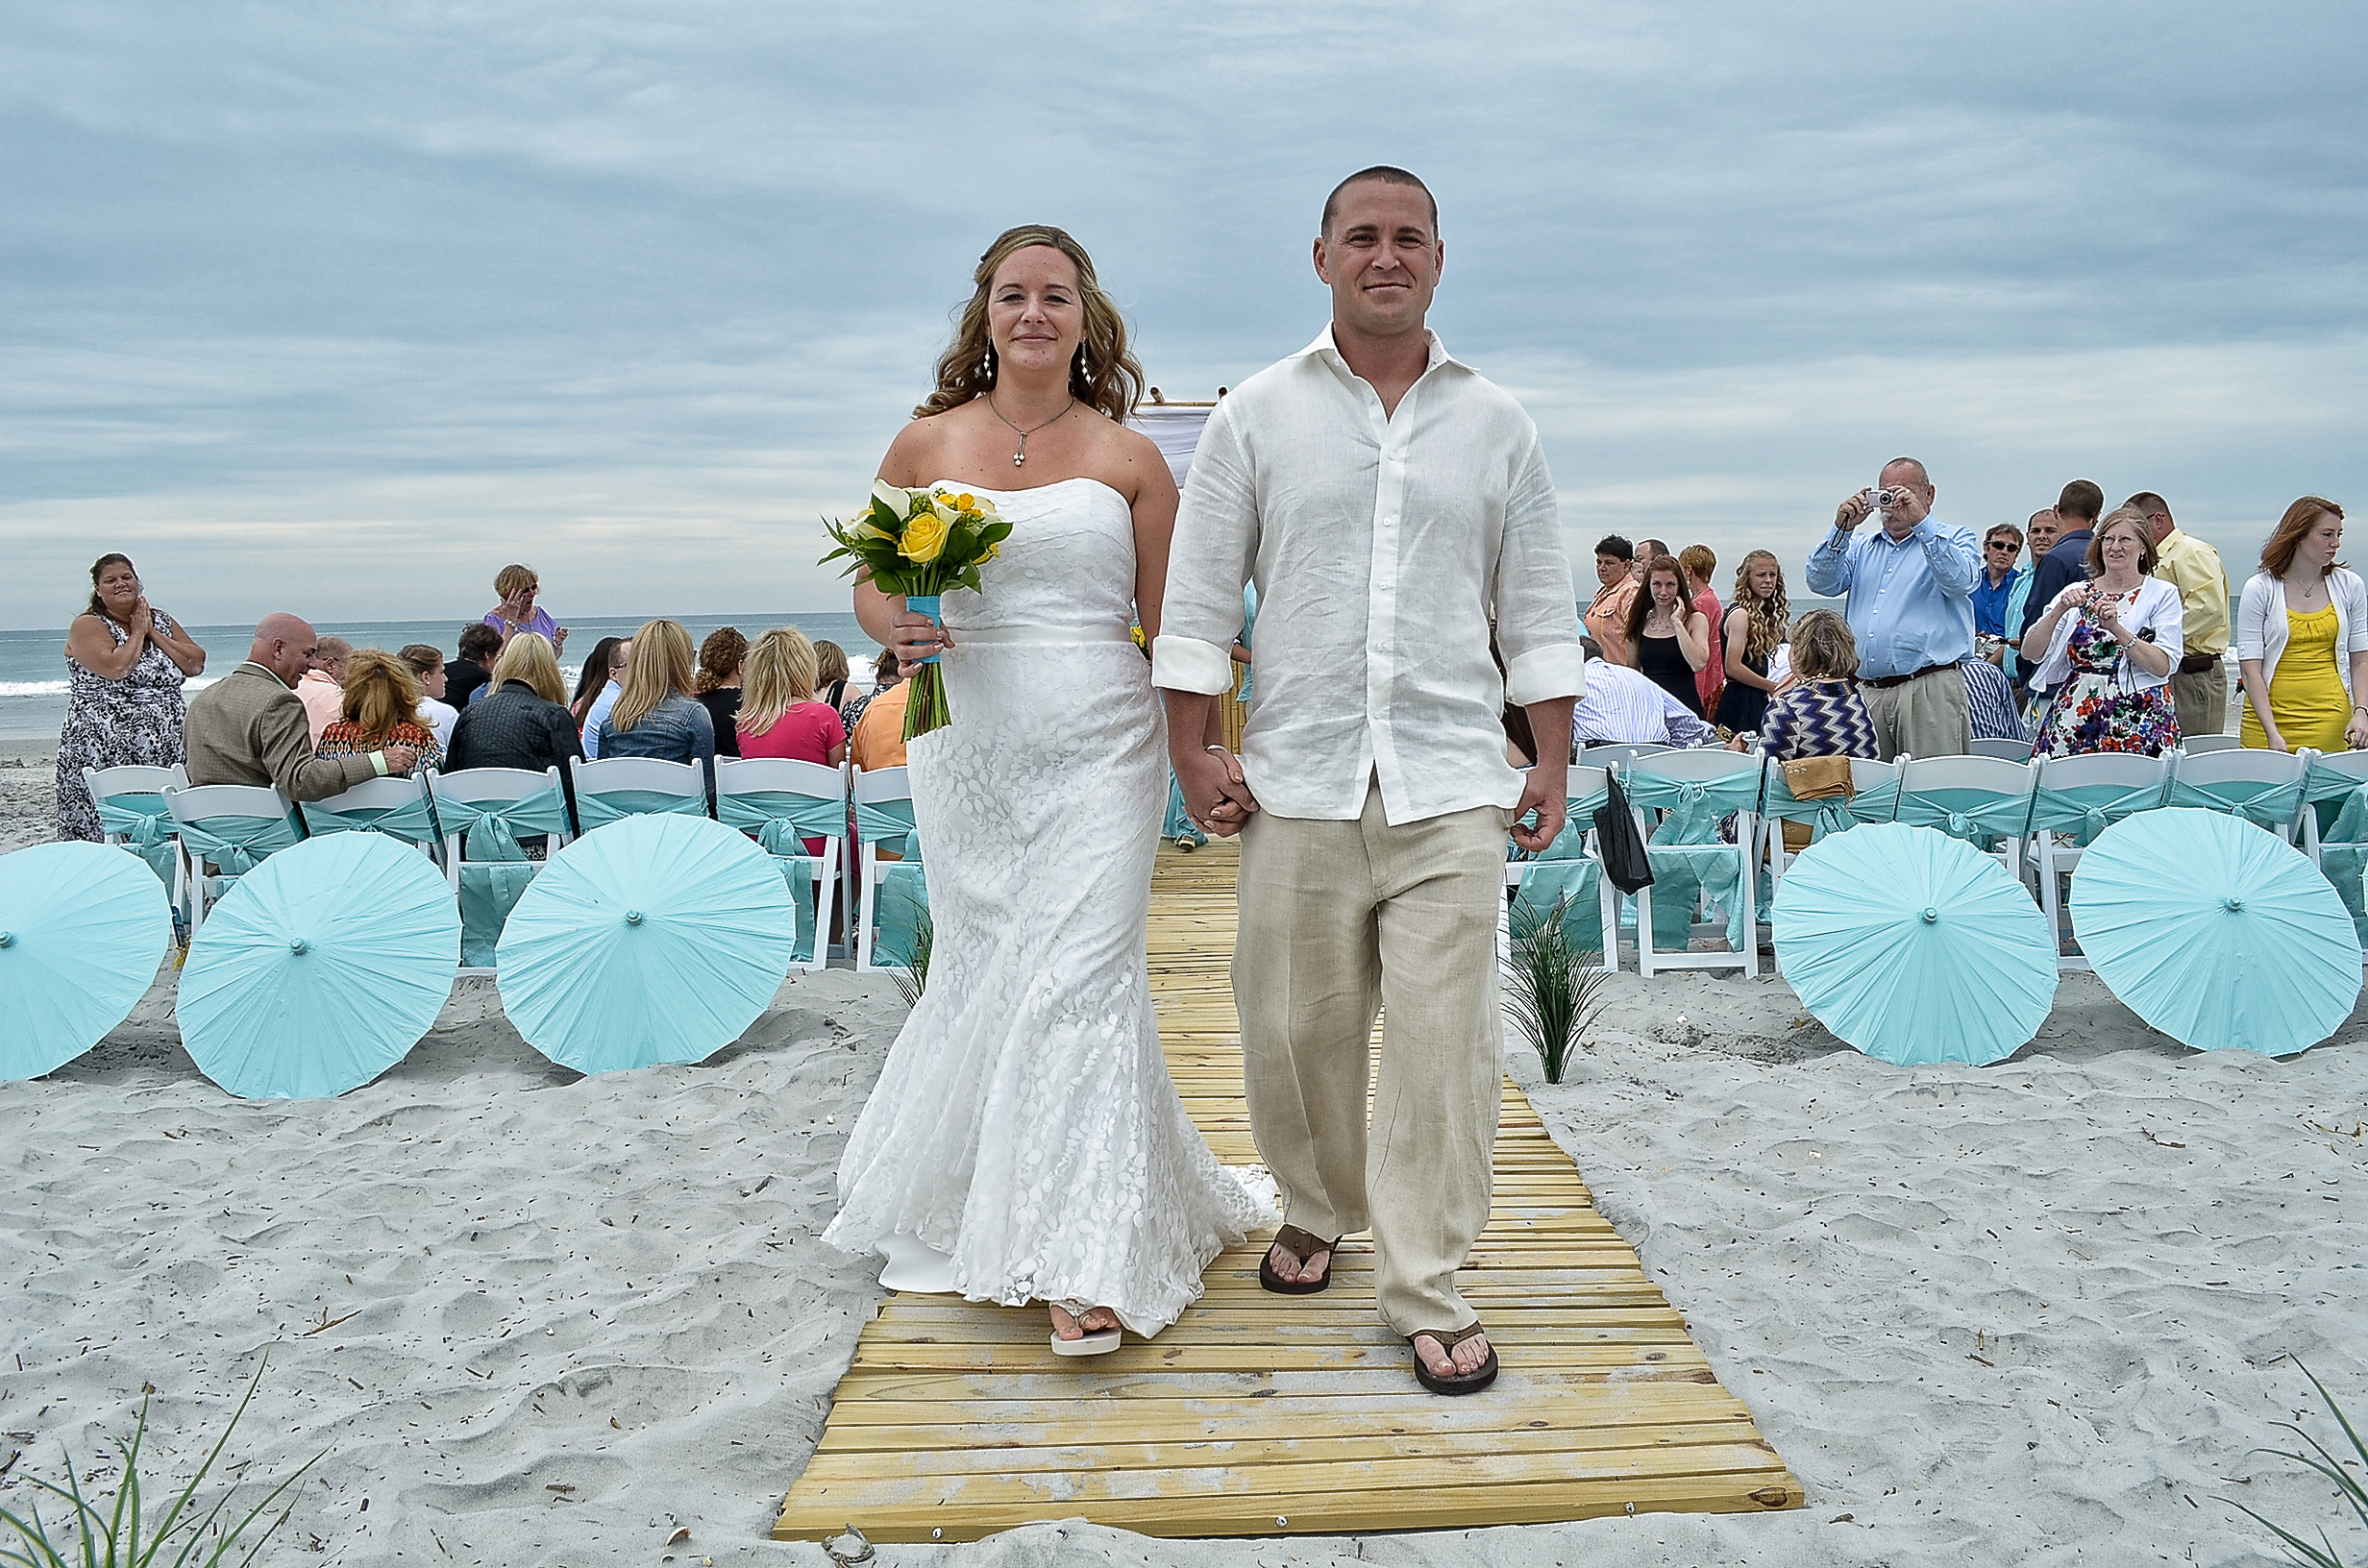 Newlyweds walking from ceremony.